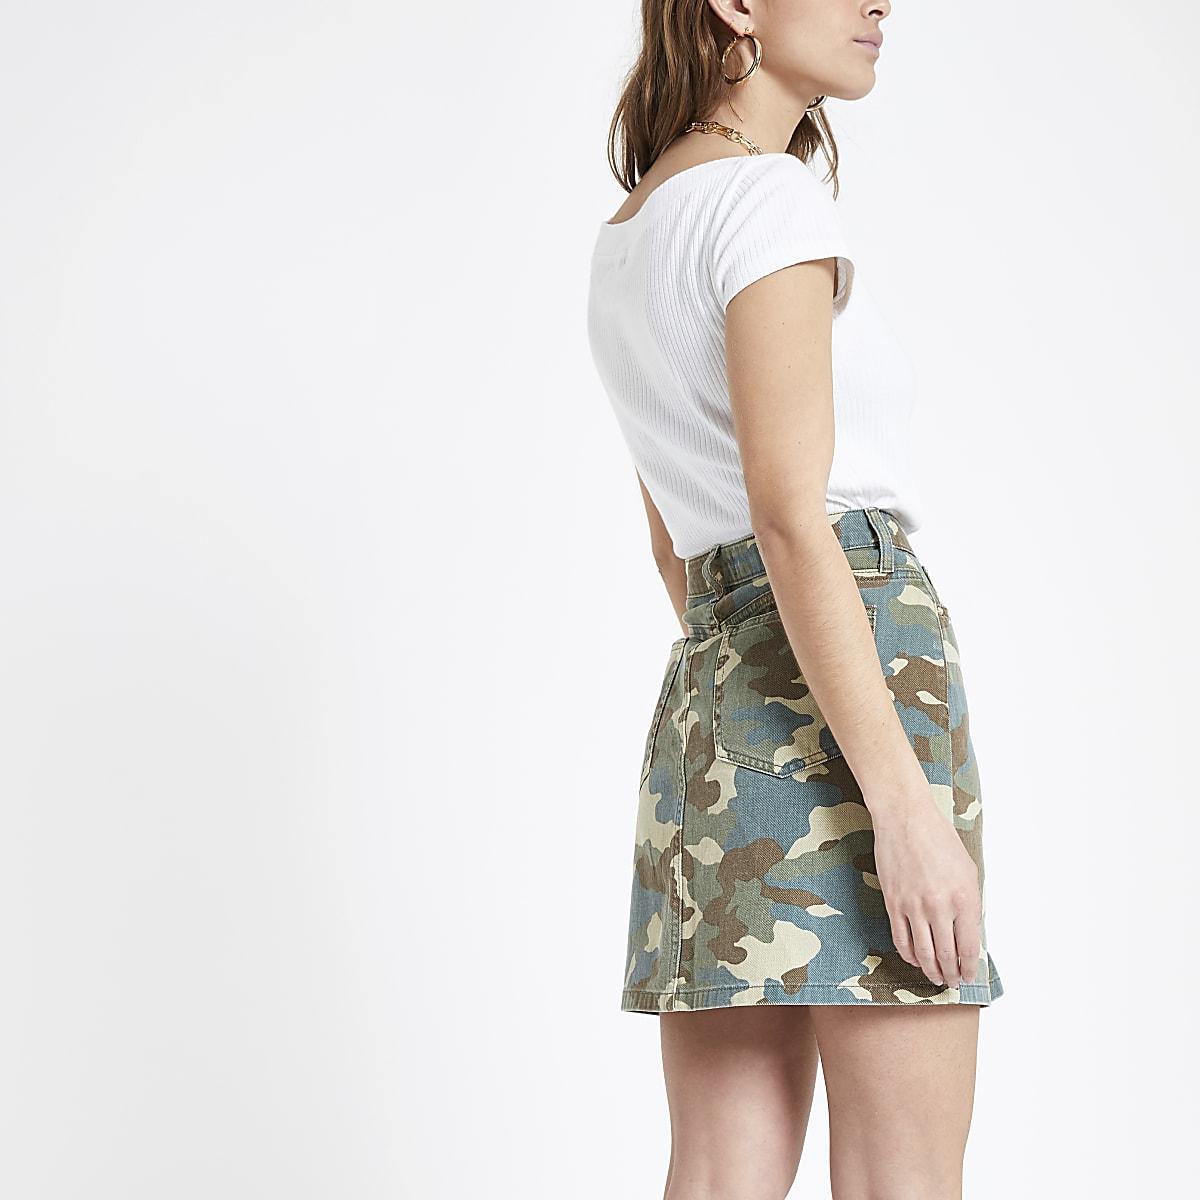 92b943a981eb Petite green camo print denim mini skirt - Mini Skirts - Skirts - women